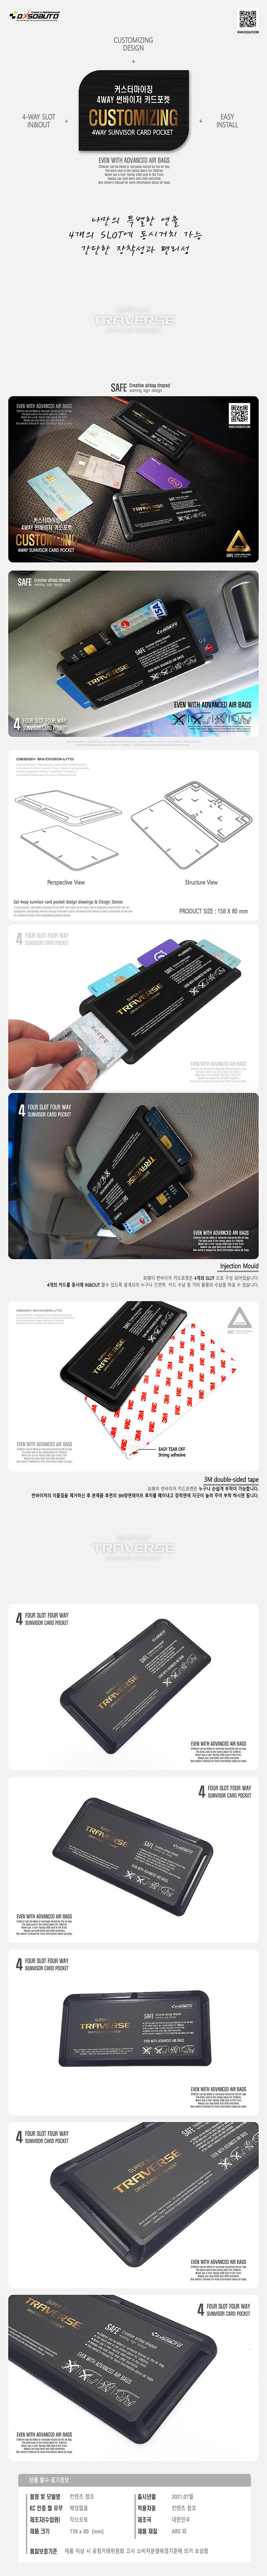 [DXSOAUTO] 커스터마이징 4WAY 썬바이저 카드포켓 (1EA / 1SET) 트래버스 블랙